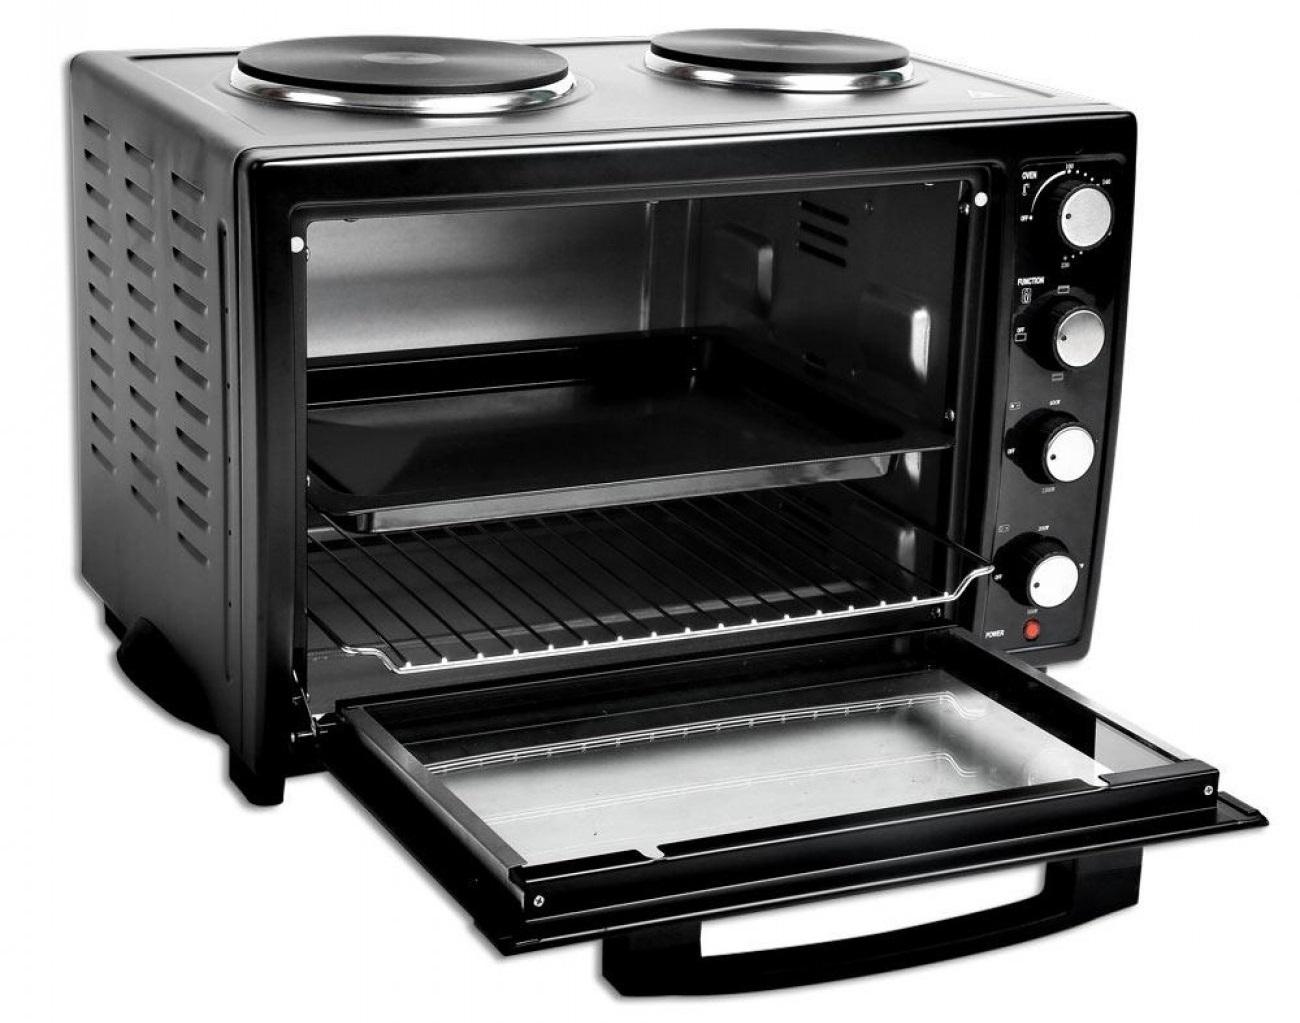 Готварска печка ZEPHYR ZP 1441 S35, 1200W, 35 л. Два котлона, Черен